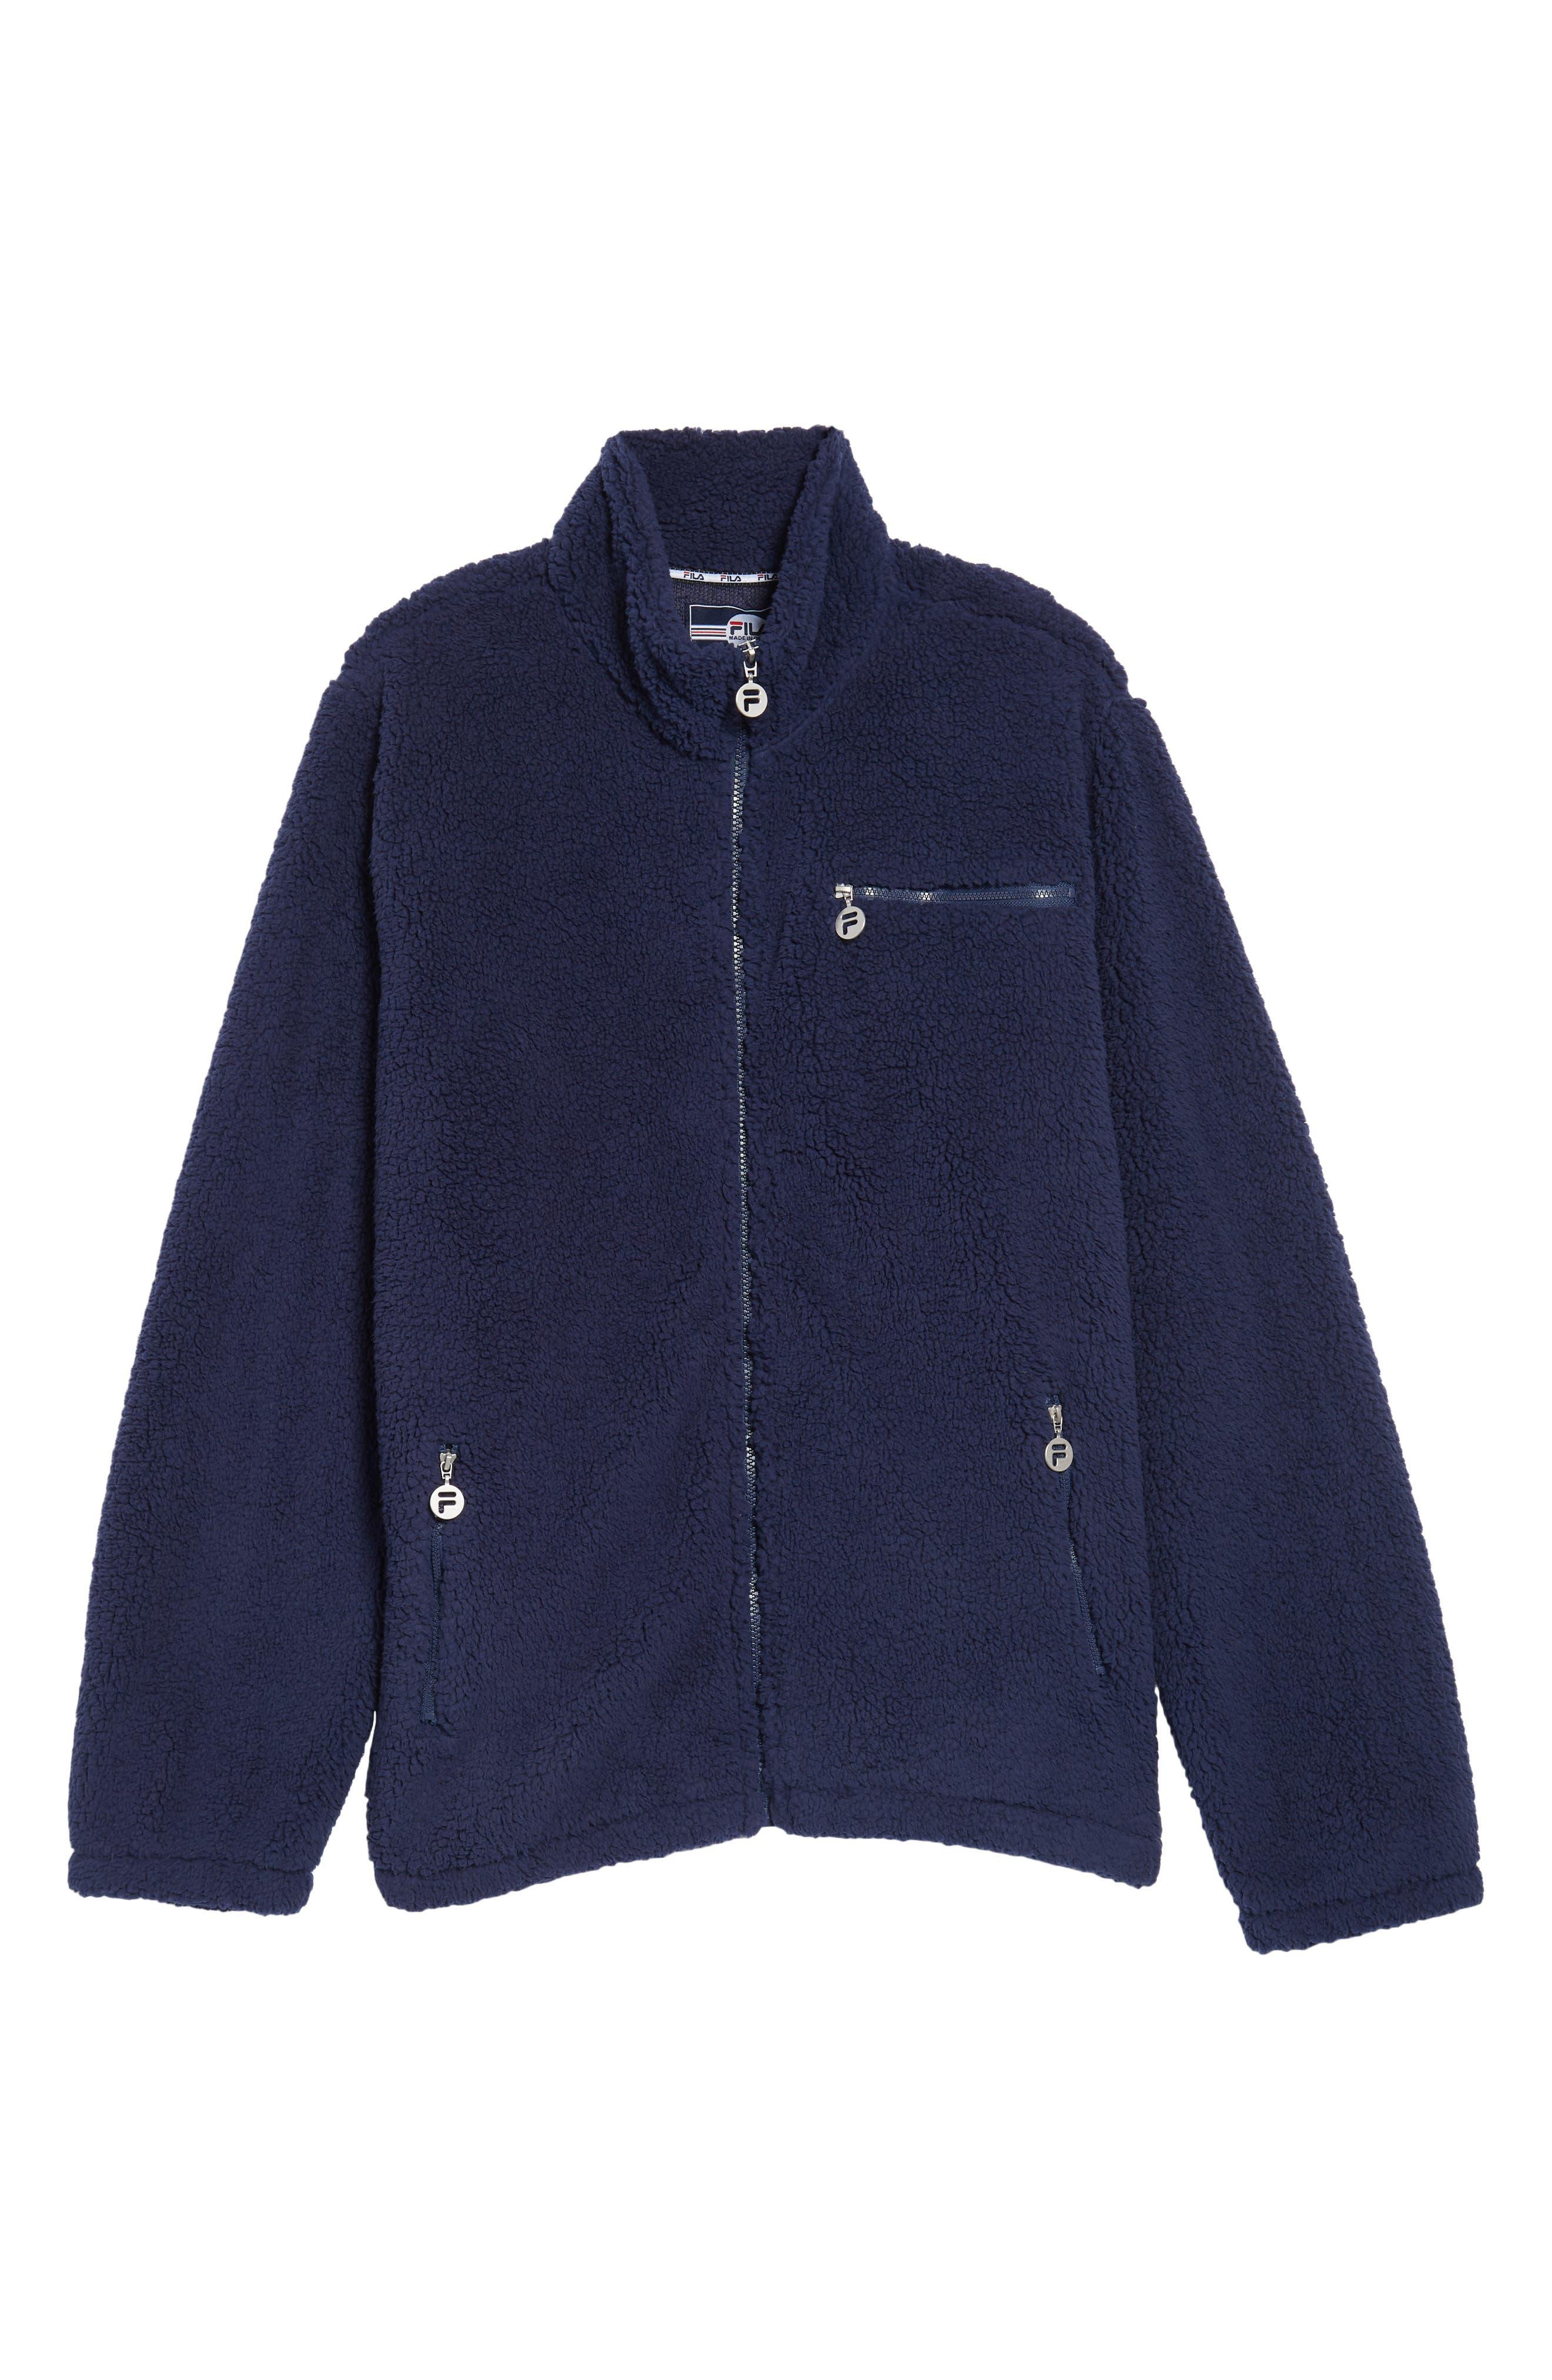 Finlay Fleece Jacket,                             Alternate thumbnail 12, color,